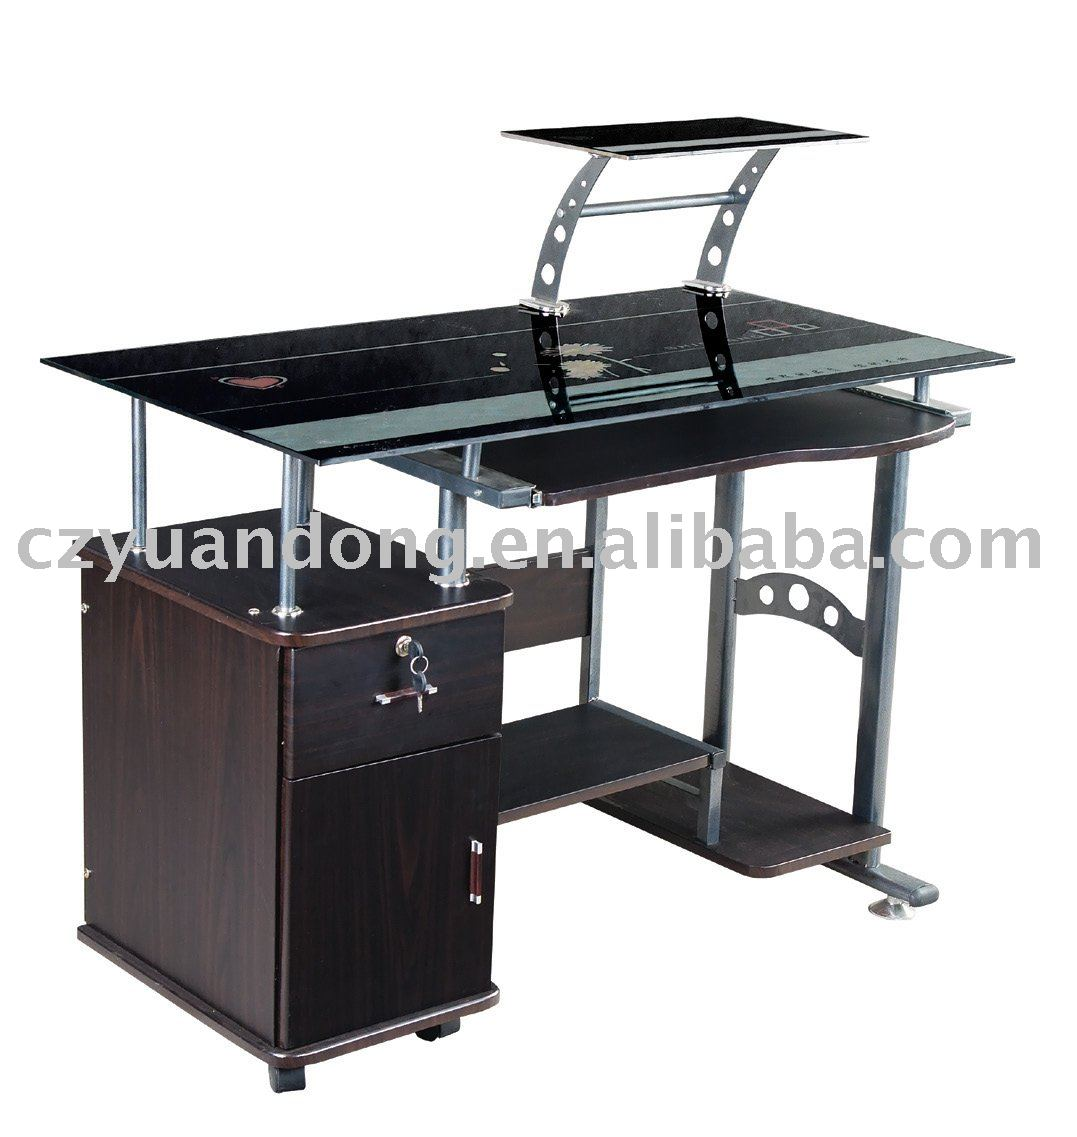 grossiste meuble d ordinateur en verre acheter les meilleurs meuble d ordinateur en verre lots. Black Bedroom Furniture Sets. Home Design Ideas